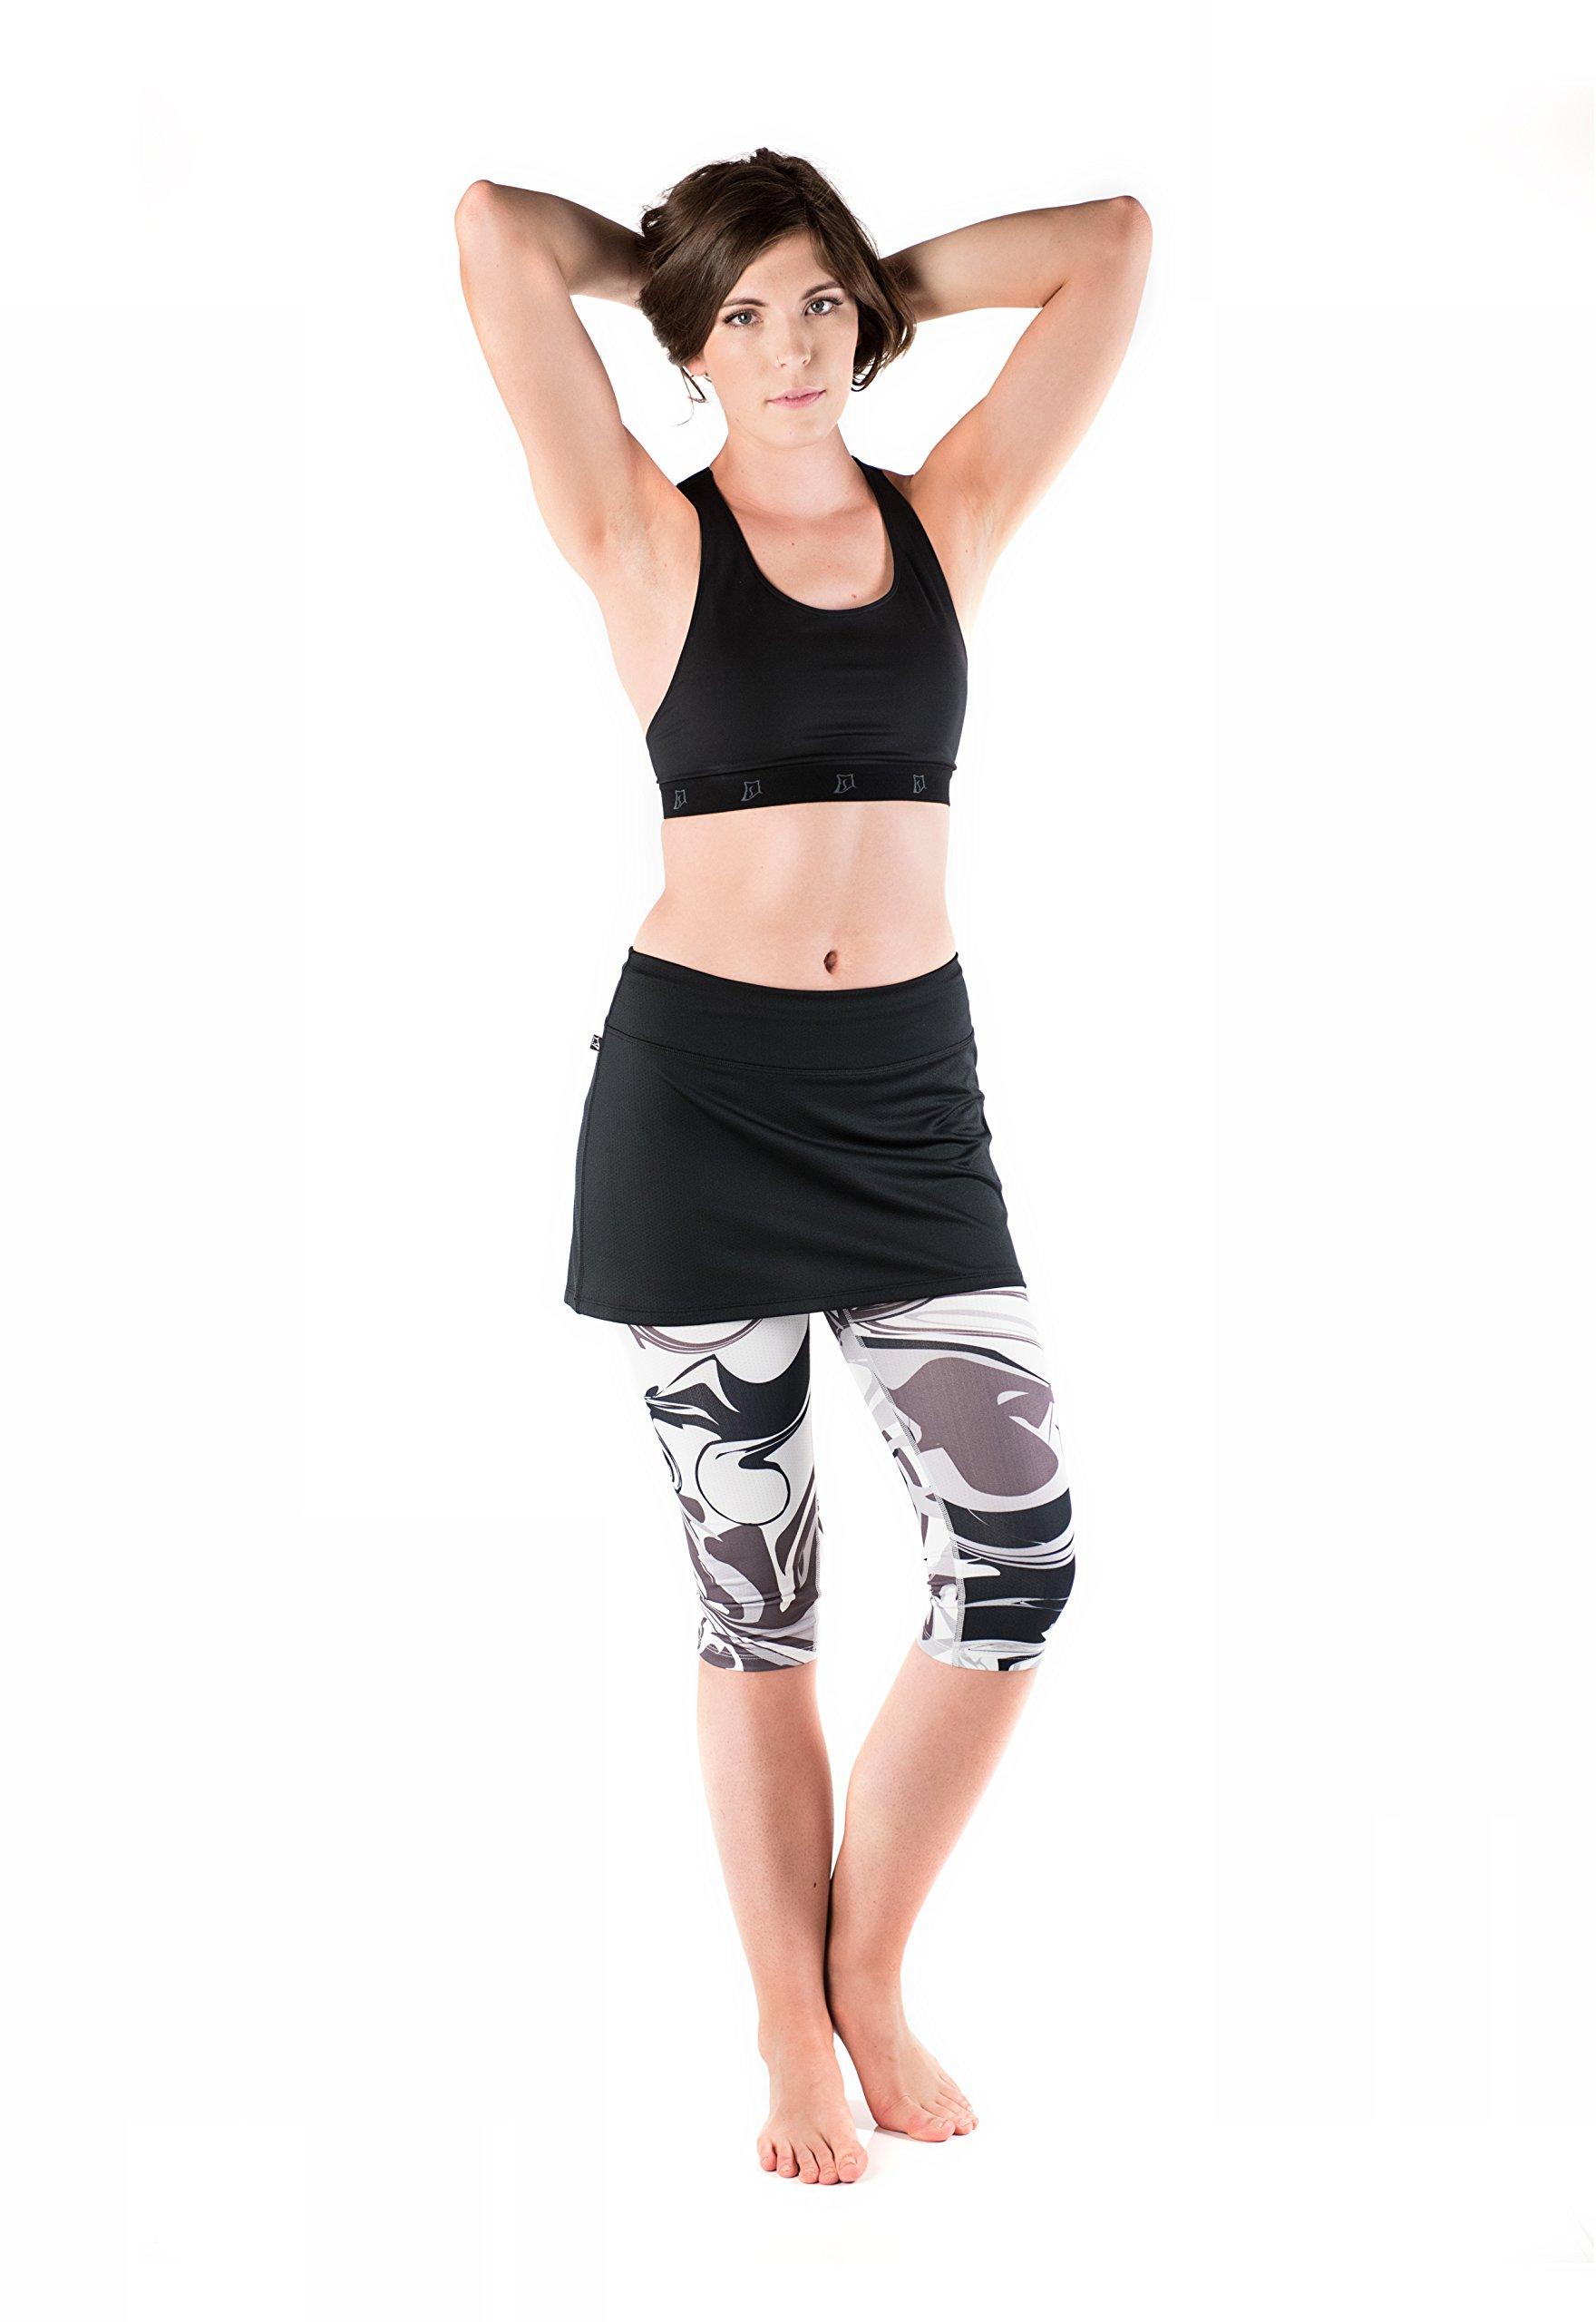 46b63b03c2 Amazon.com  Skirt Sports  Bras